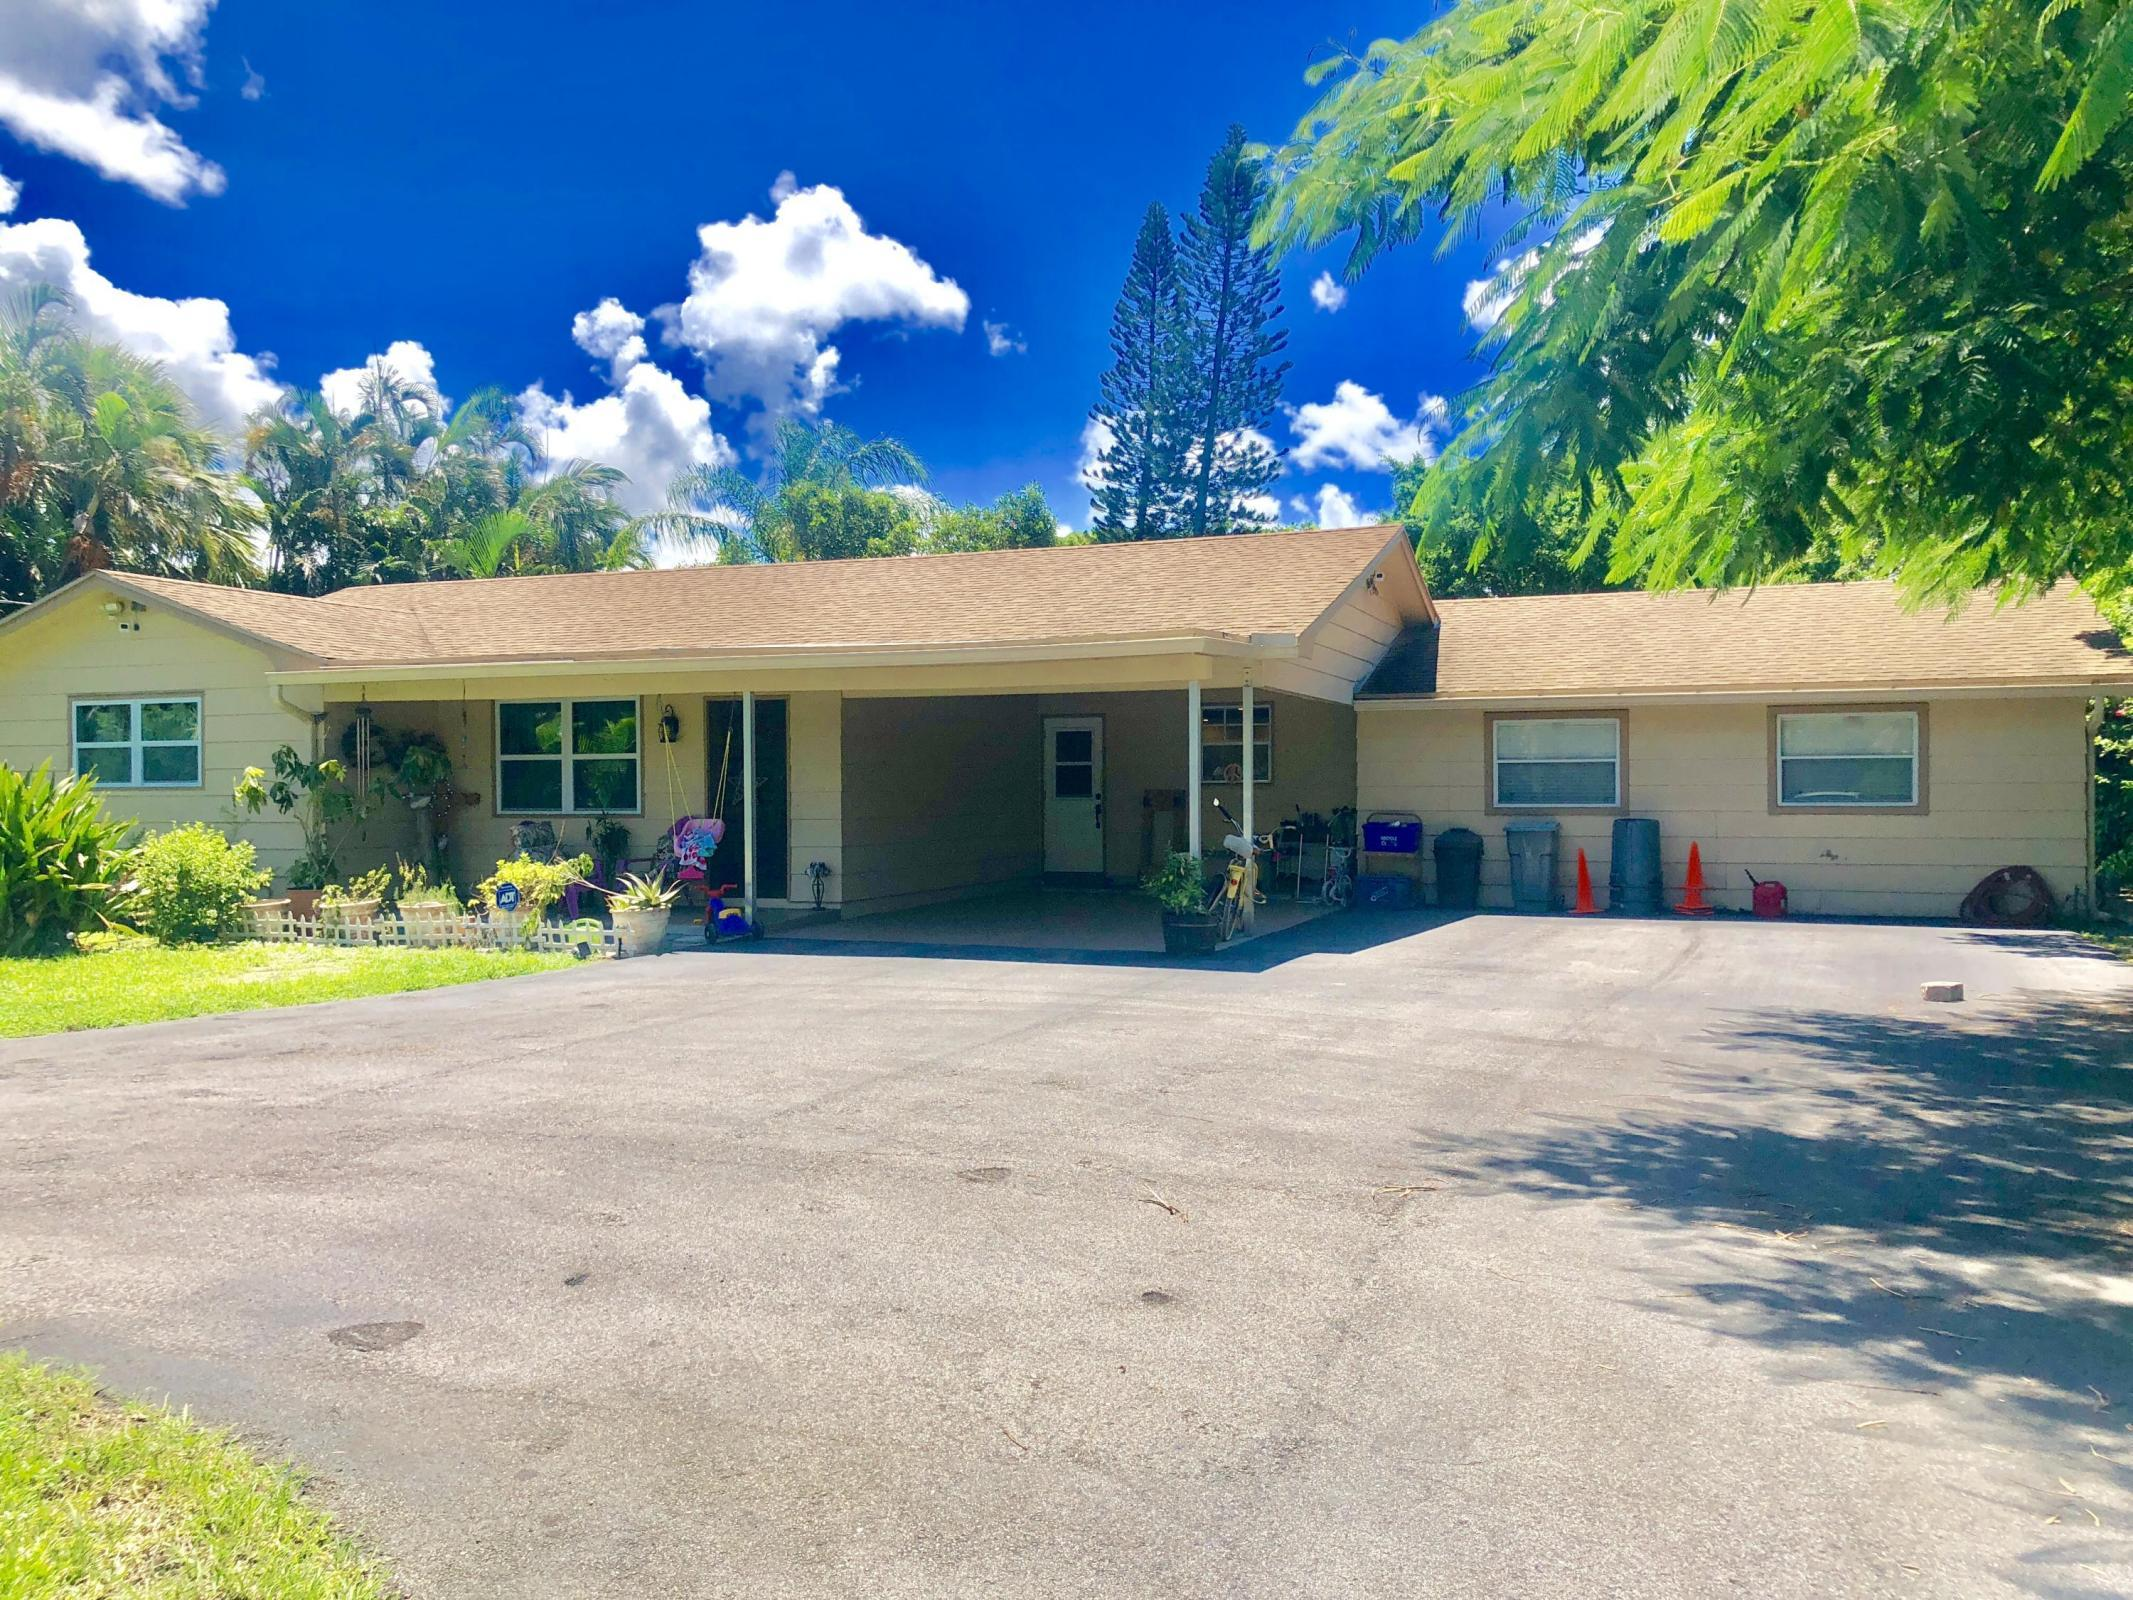 323 Kirk, West Palm Beach, Florida 33406